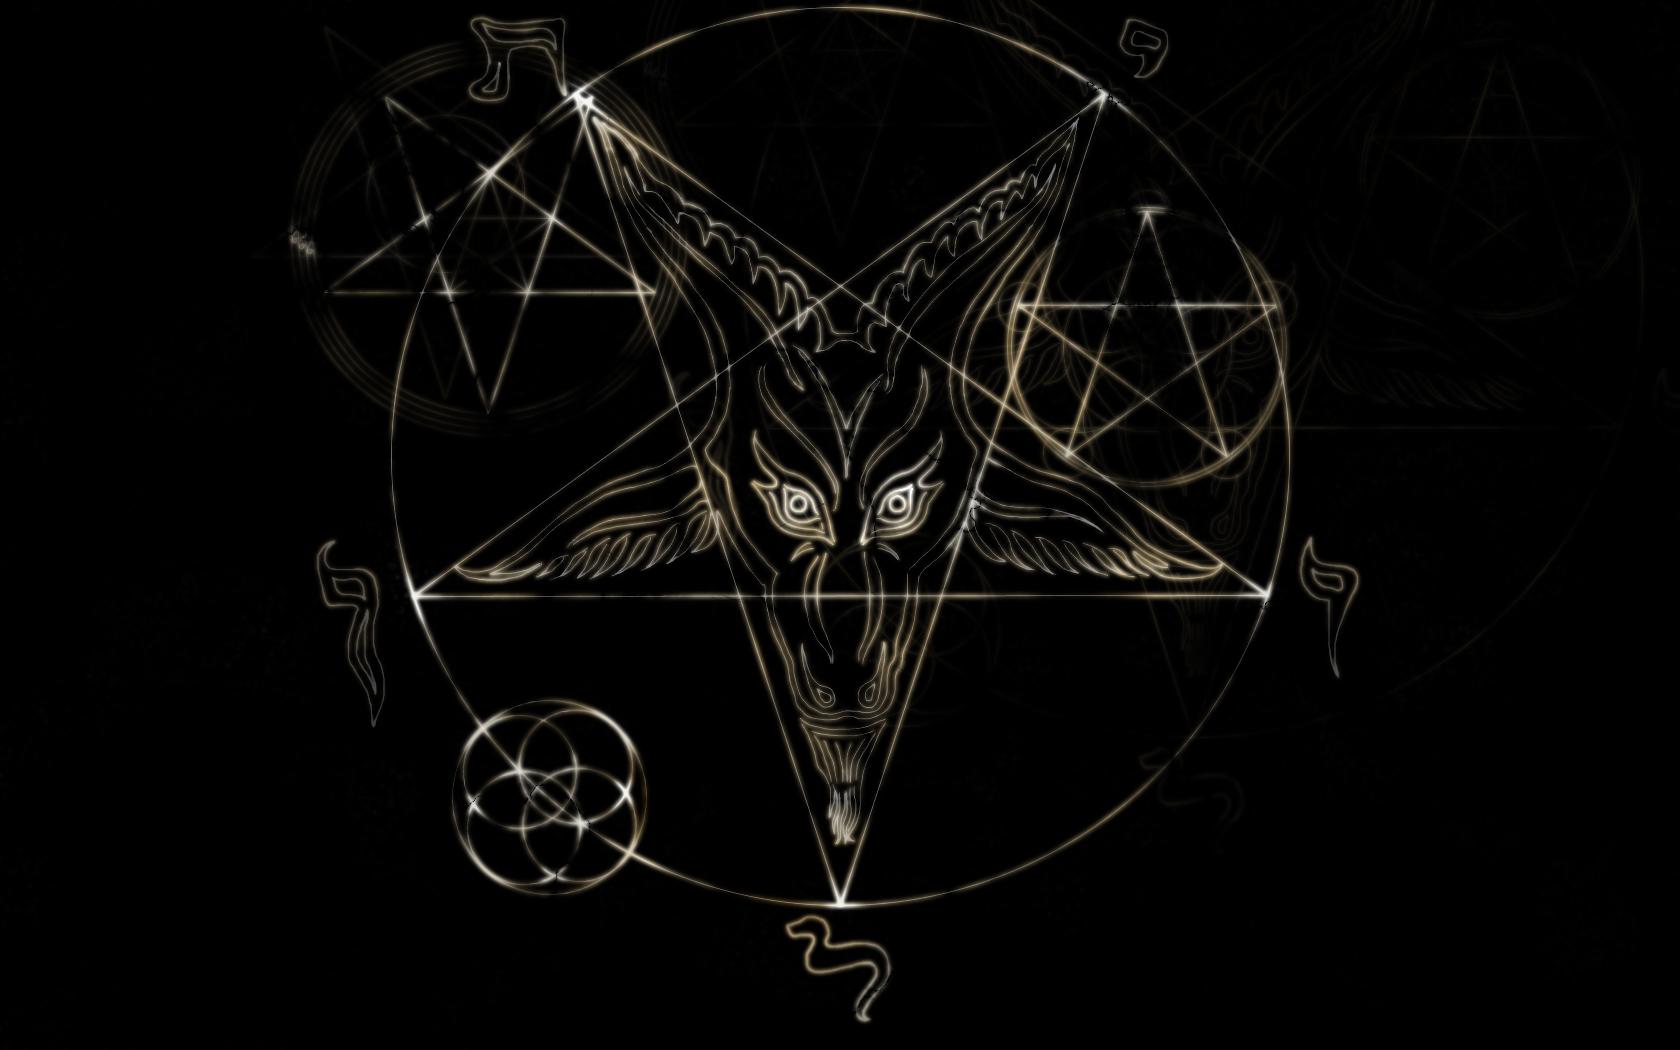 Occult Computer Wallpapers Desktop Backgrounds 1680x1050 ID 1680x1050